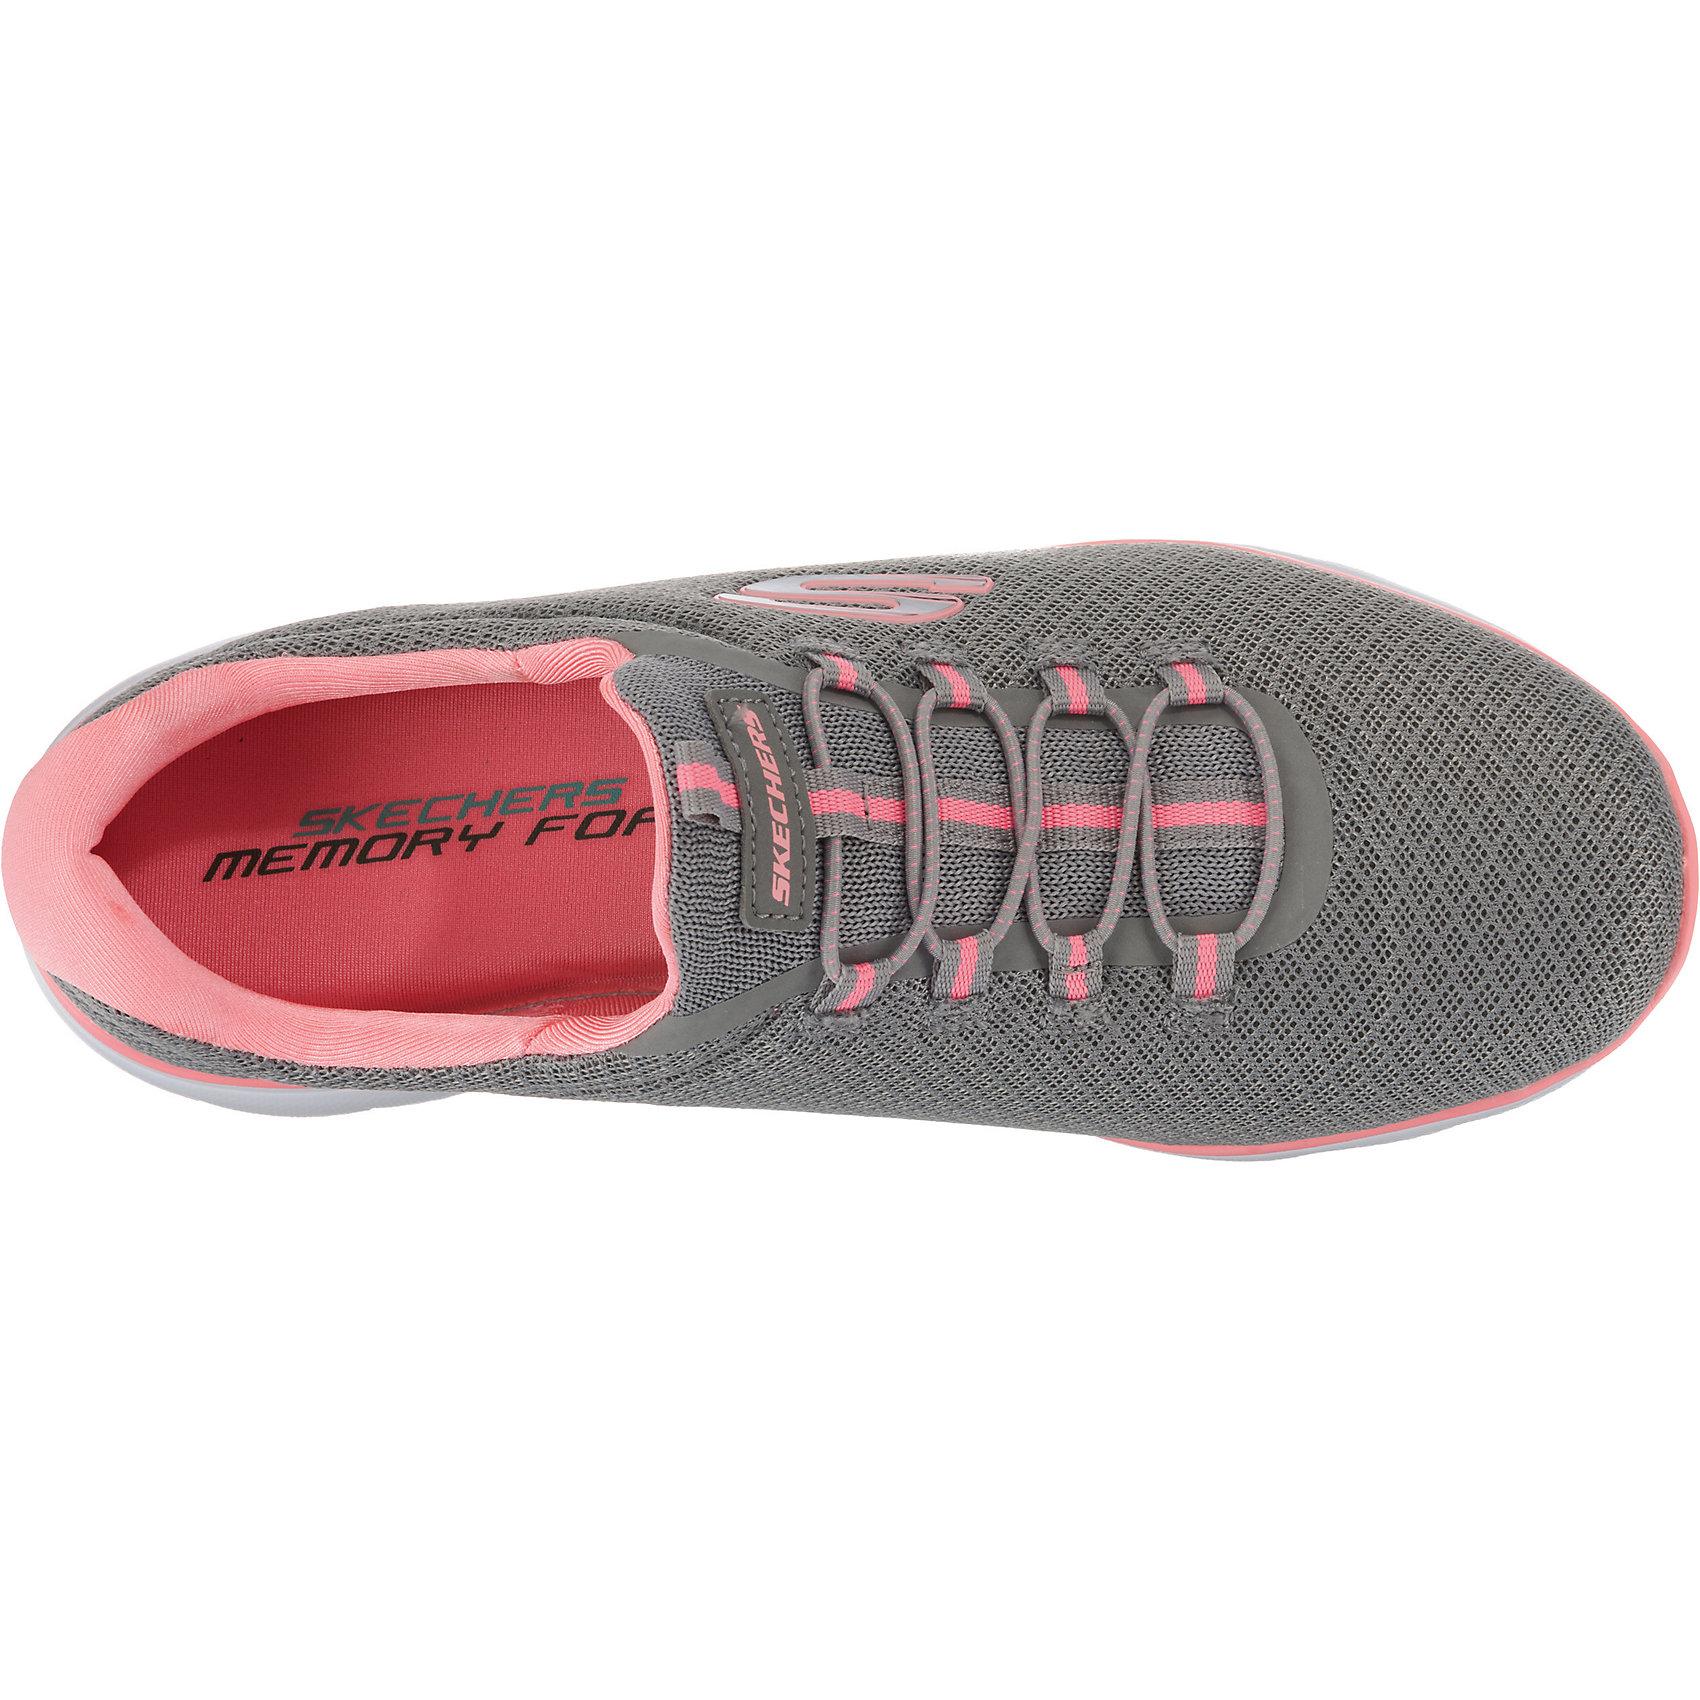 Neu SKECHERS SUMMITS Sneakers Low 8666101 für Damen grau weiß